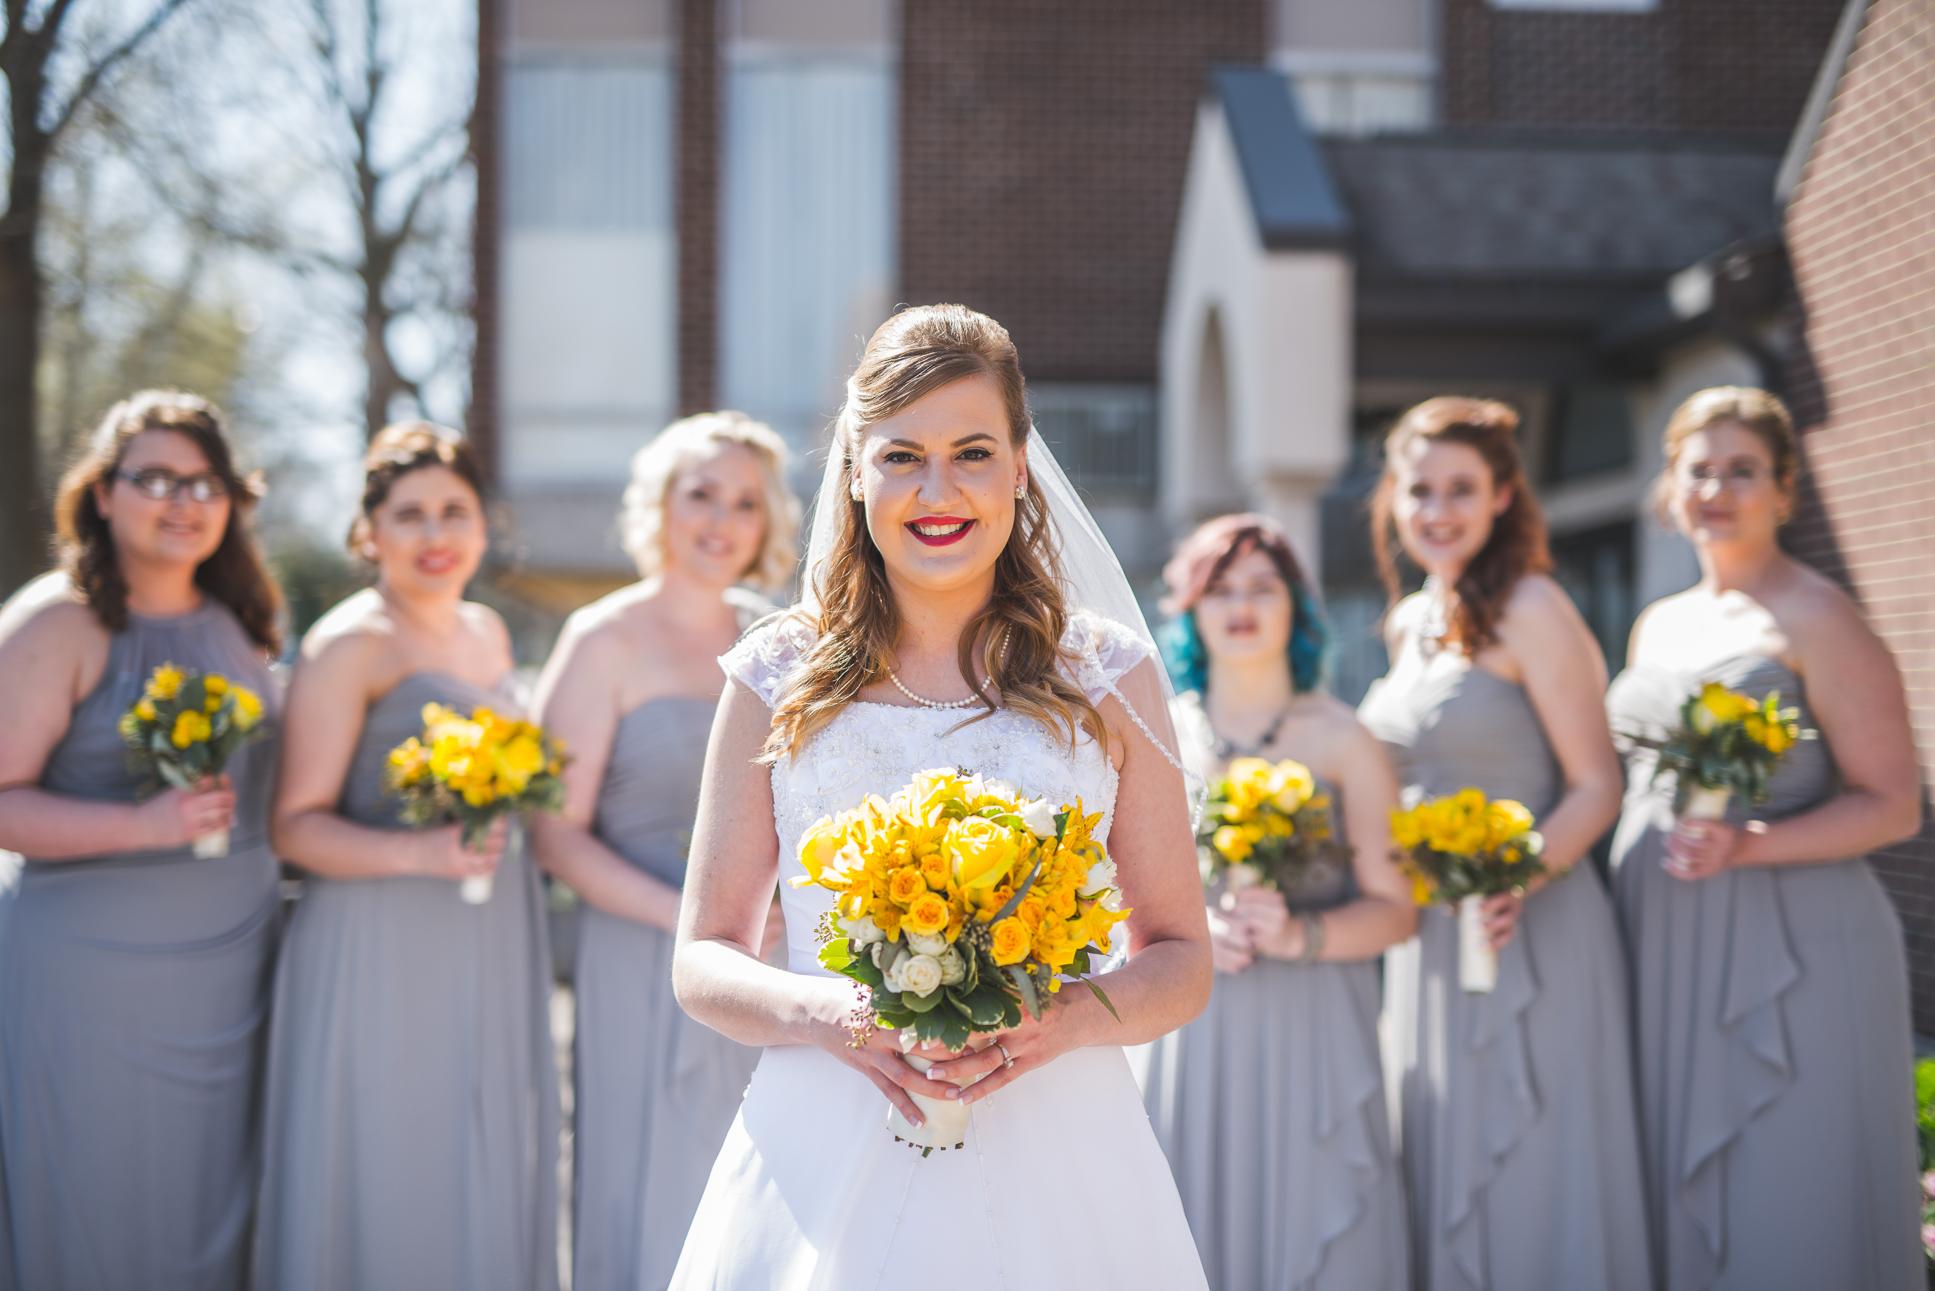 Karle & Josh Wedding - Dustin Morrison Photography-34.jpg